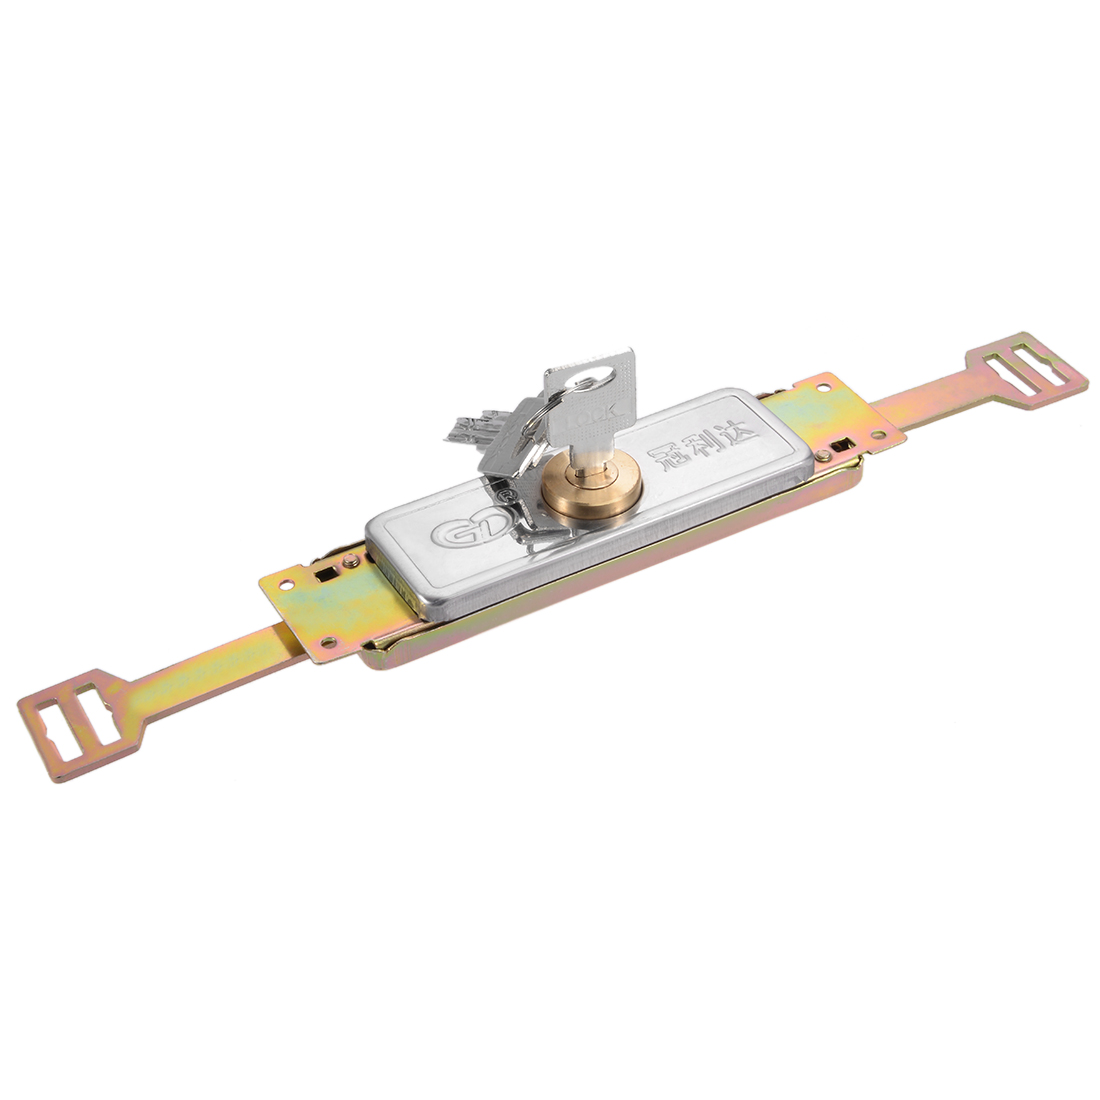 302mm Locked Length Cylinder Moon Key Type Safety Rolling Shutter Door Lock